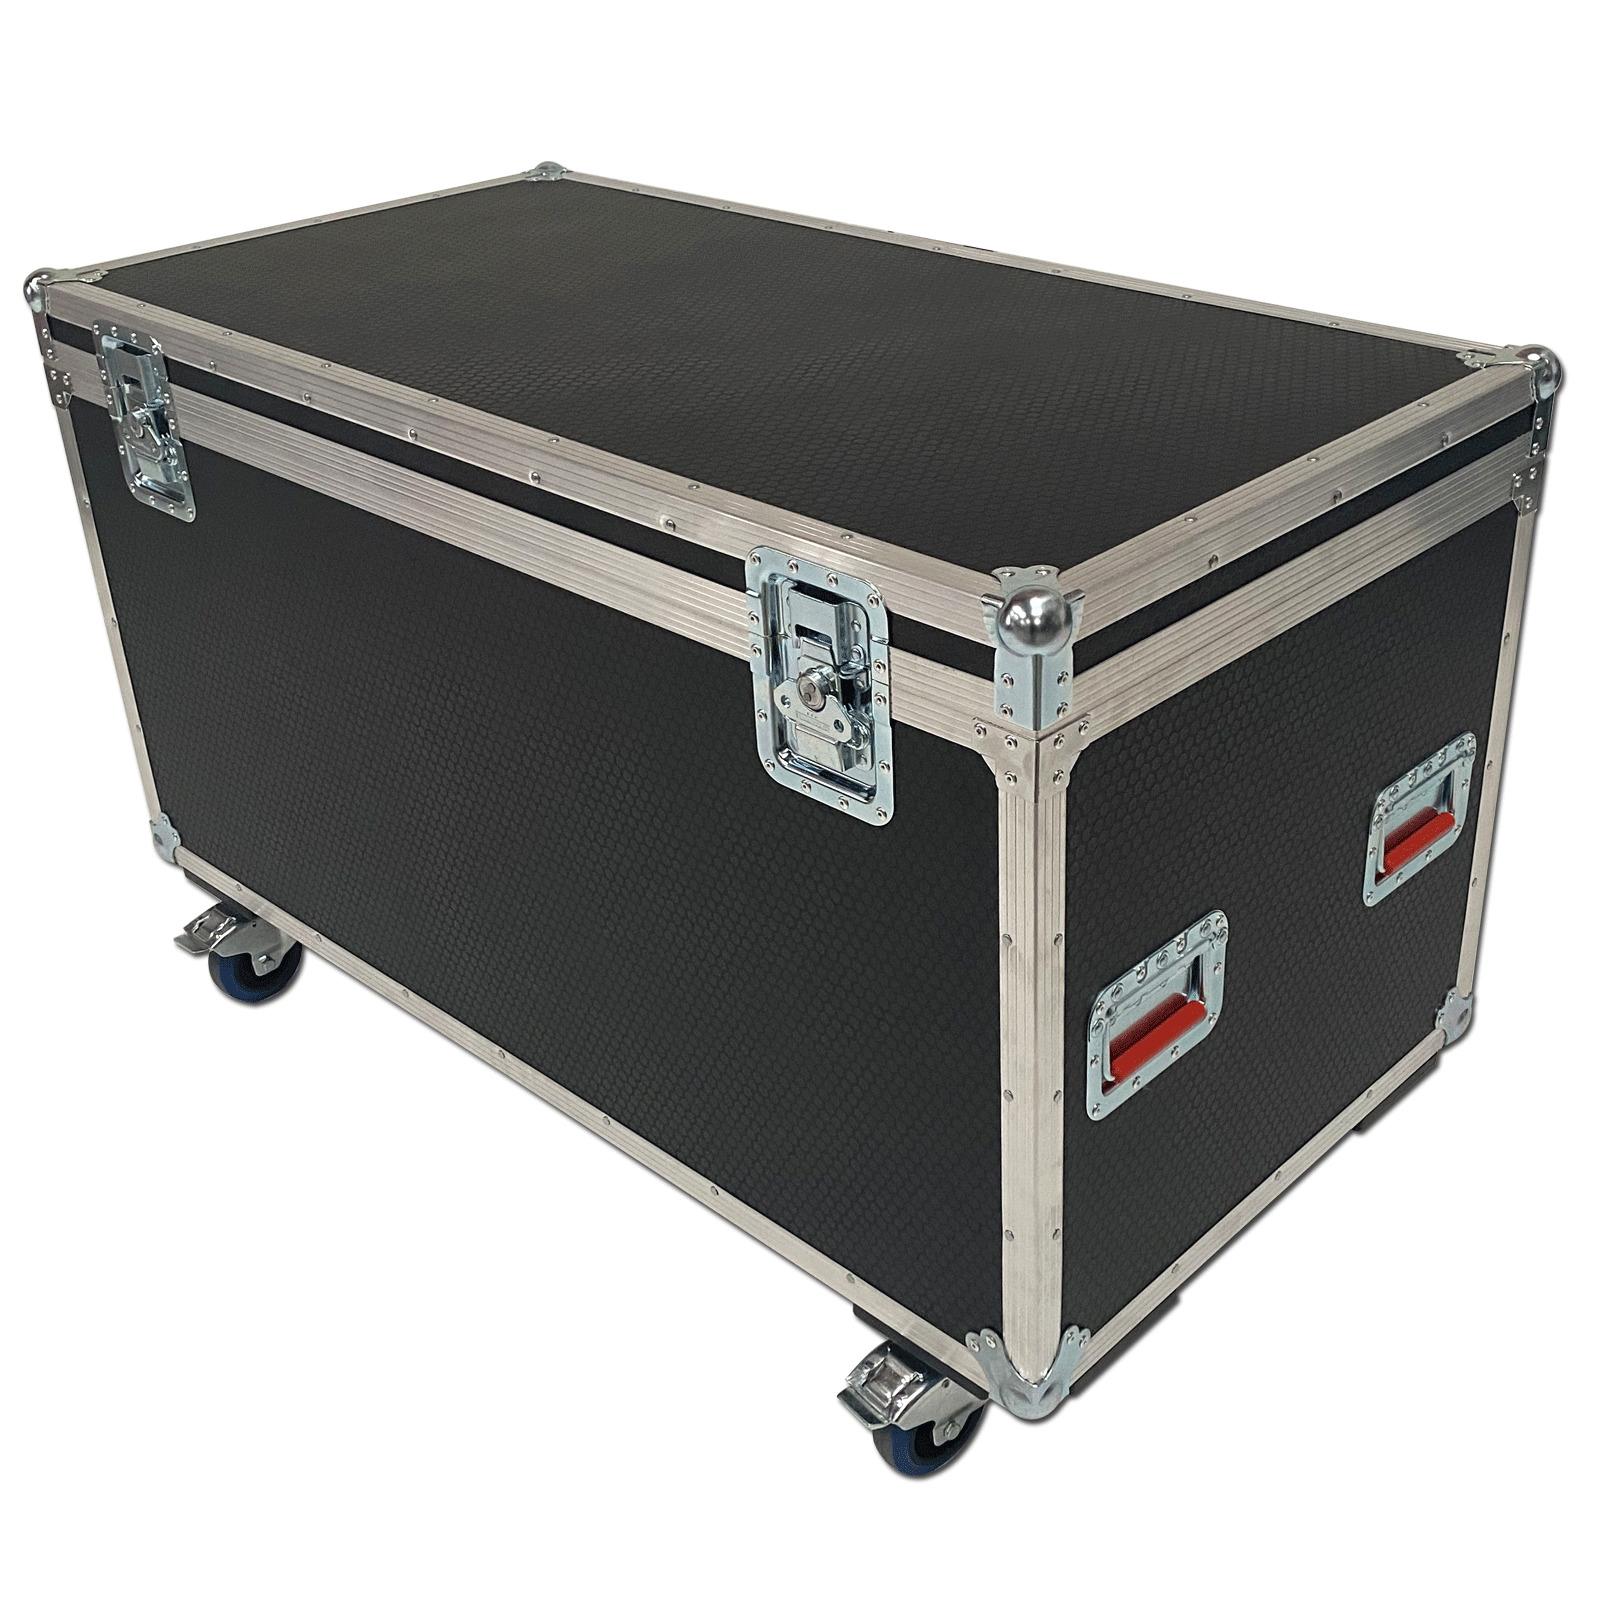 costume storage flight case 1200 x 600 x 600. Black Bedroom Furniture Sets. Home Design Ideas